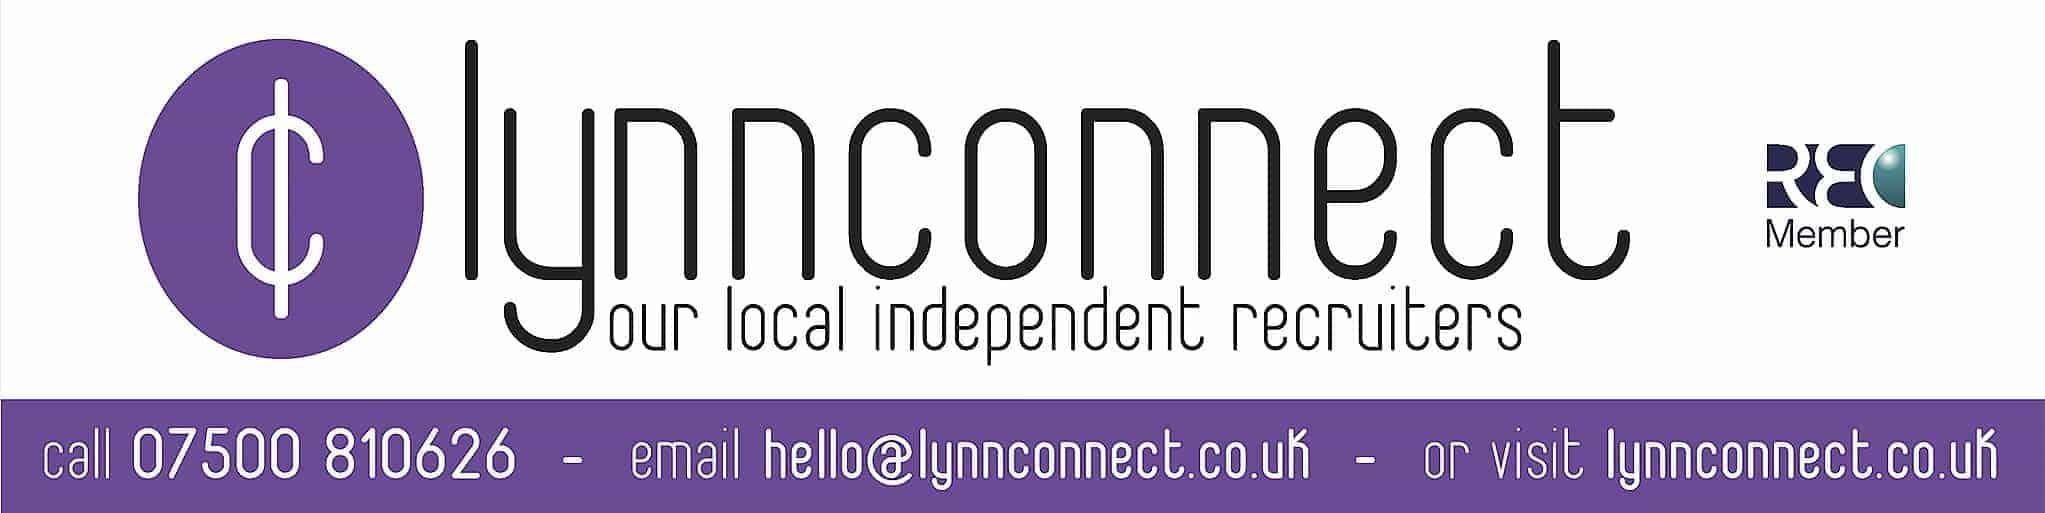 Lynnconnect recruitment banner